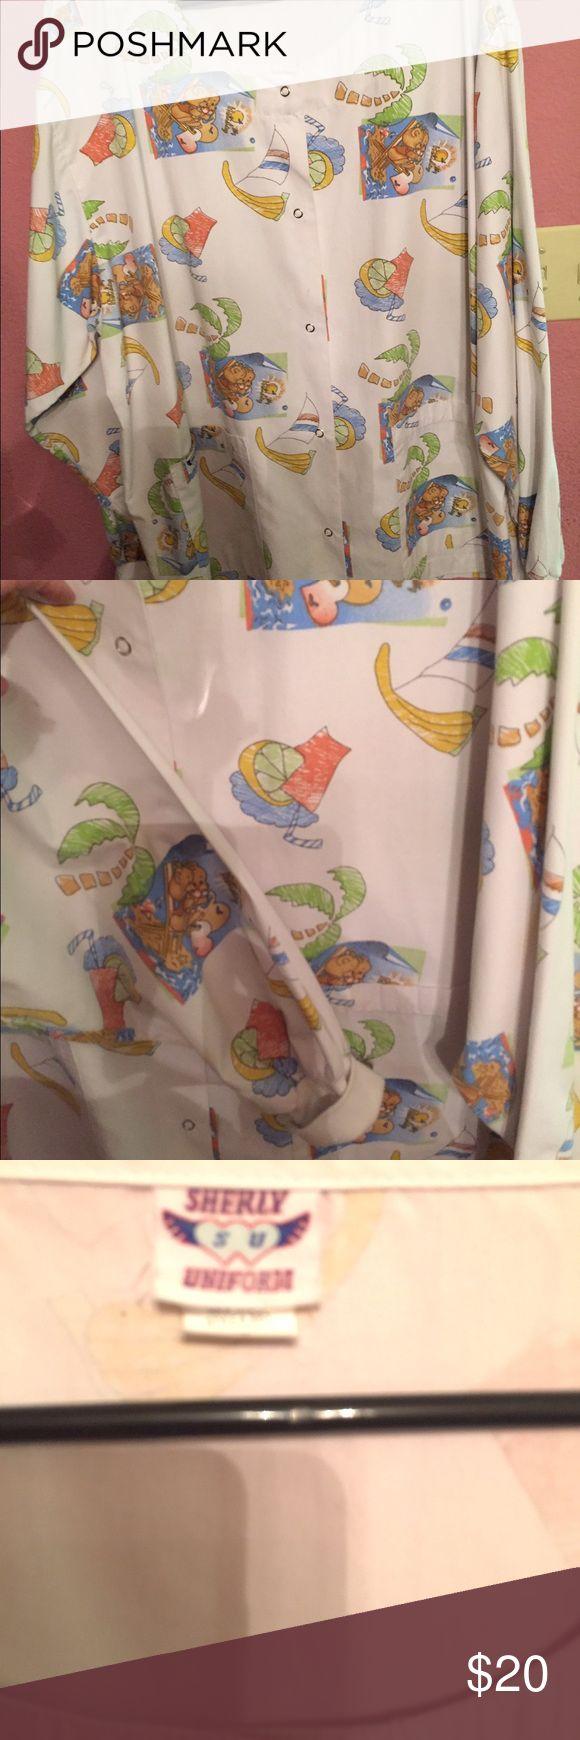 17 Best ideas about Medical Uniforms on Pinterest | Scrubs ...